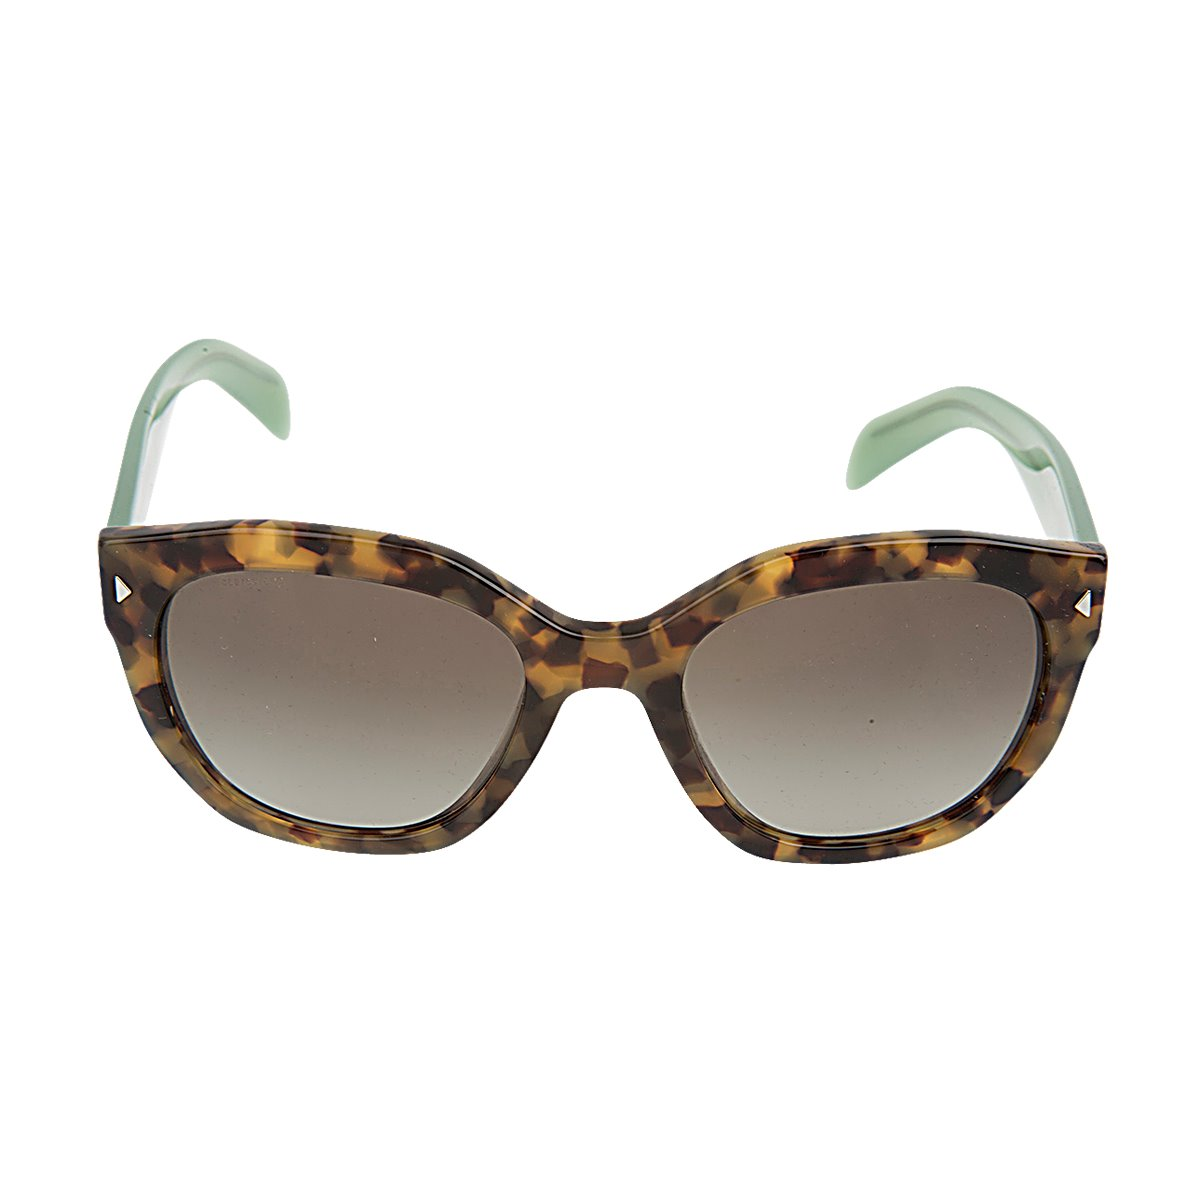 5e4773e74e258 Details about New Authentic Women s Prada SPR12S UEZ4K1 Havana Green Grey  Gradient Sunglasses